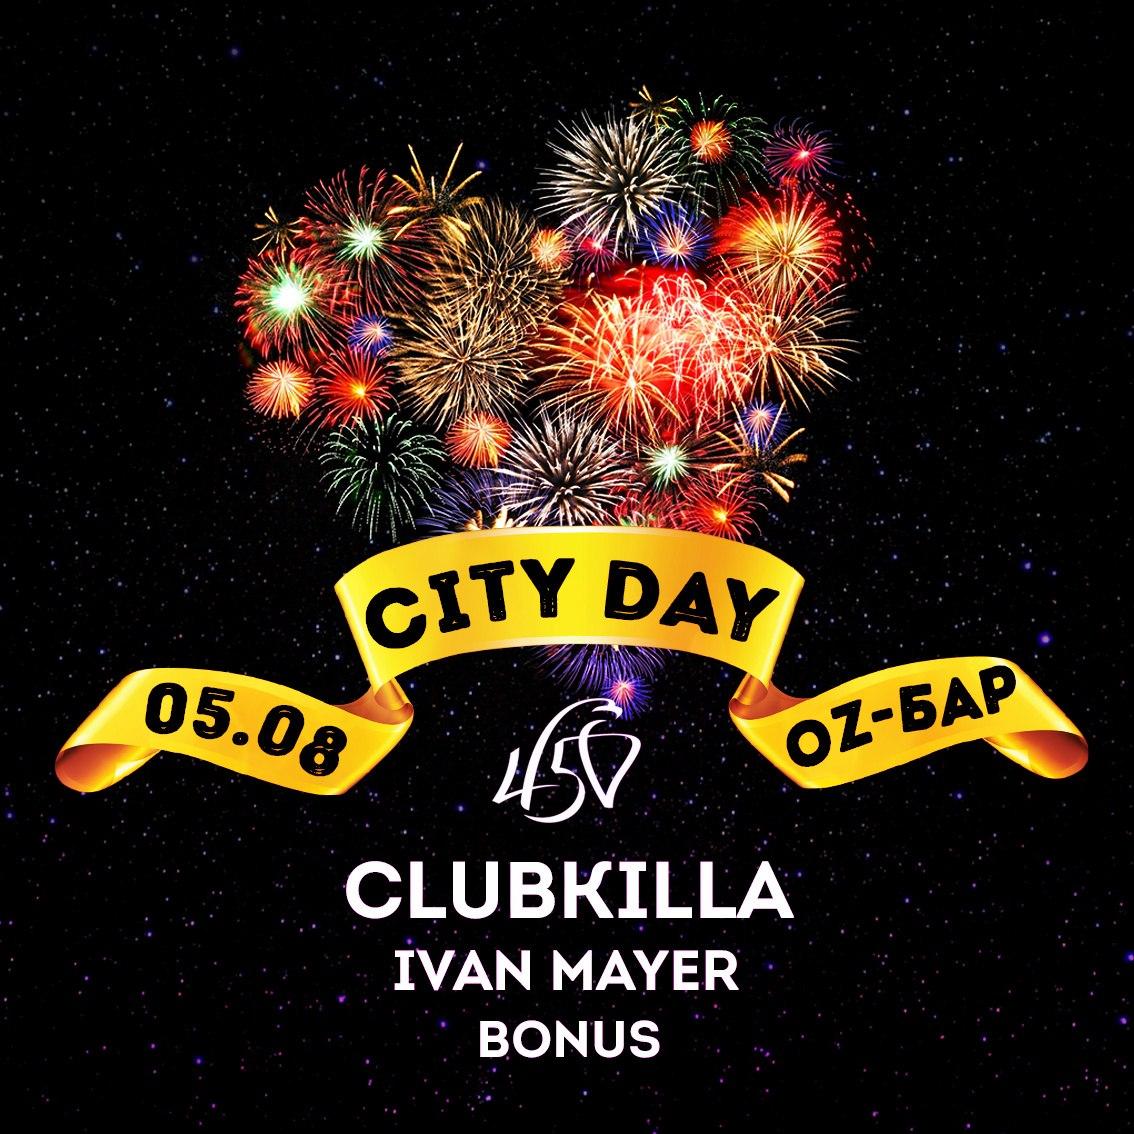 City Day